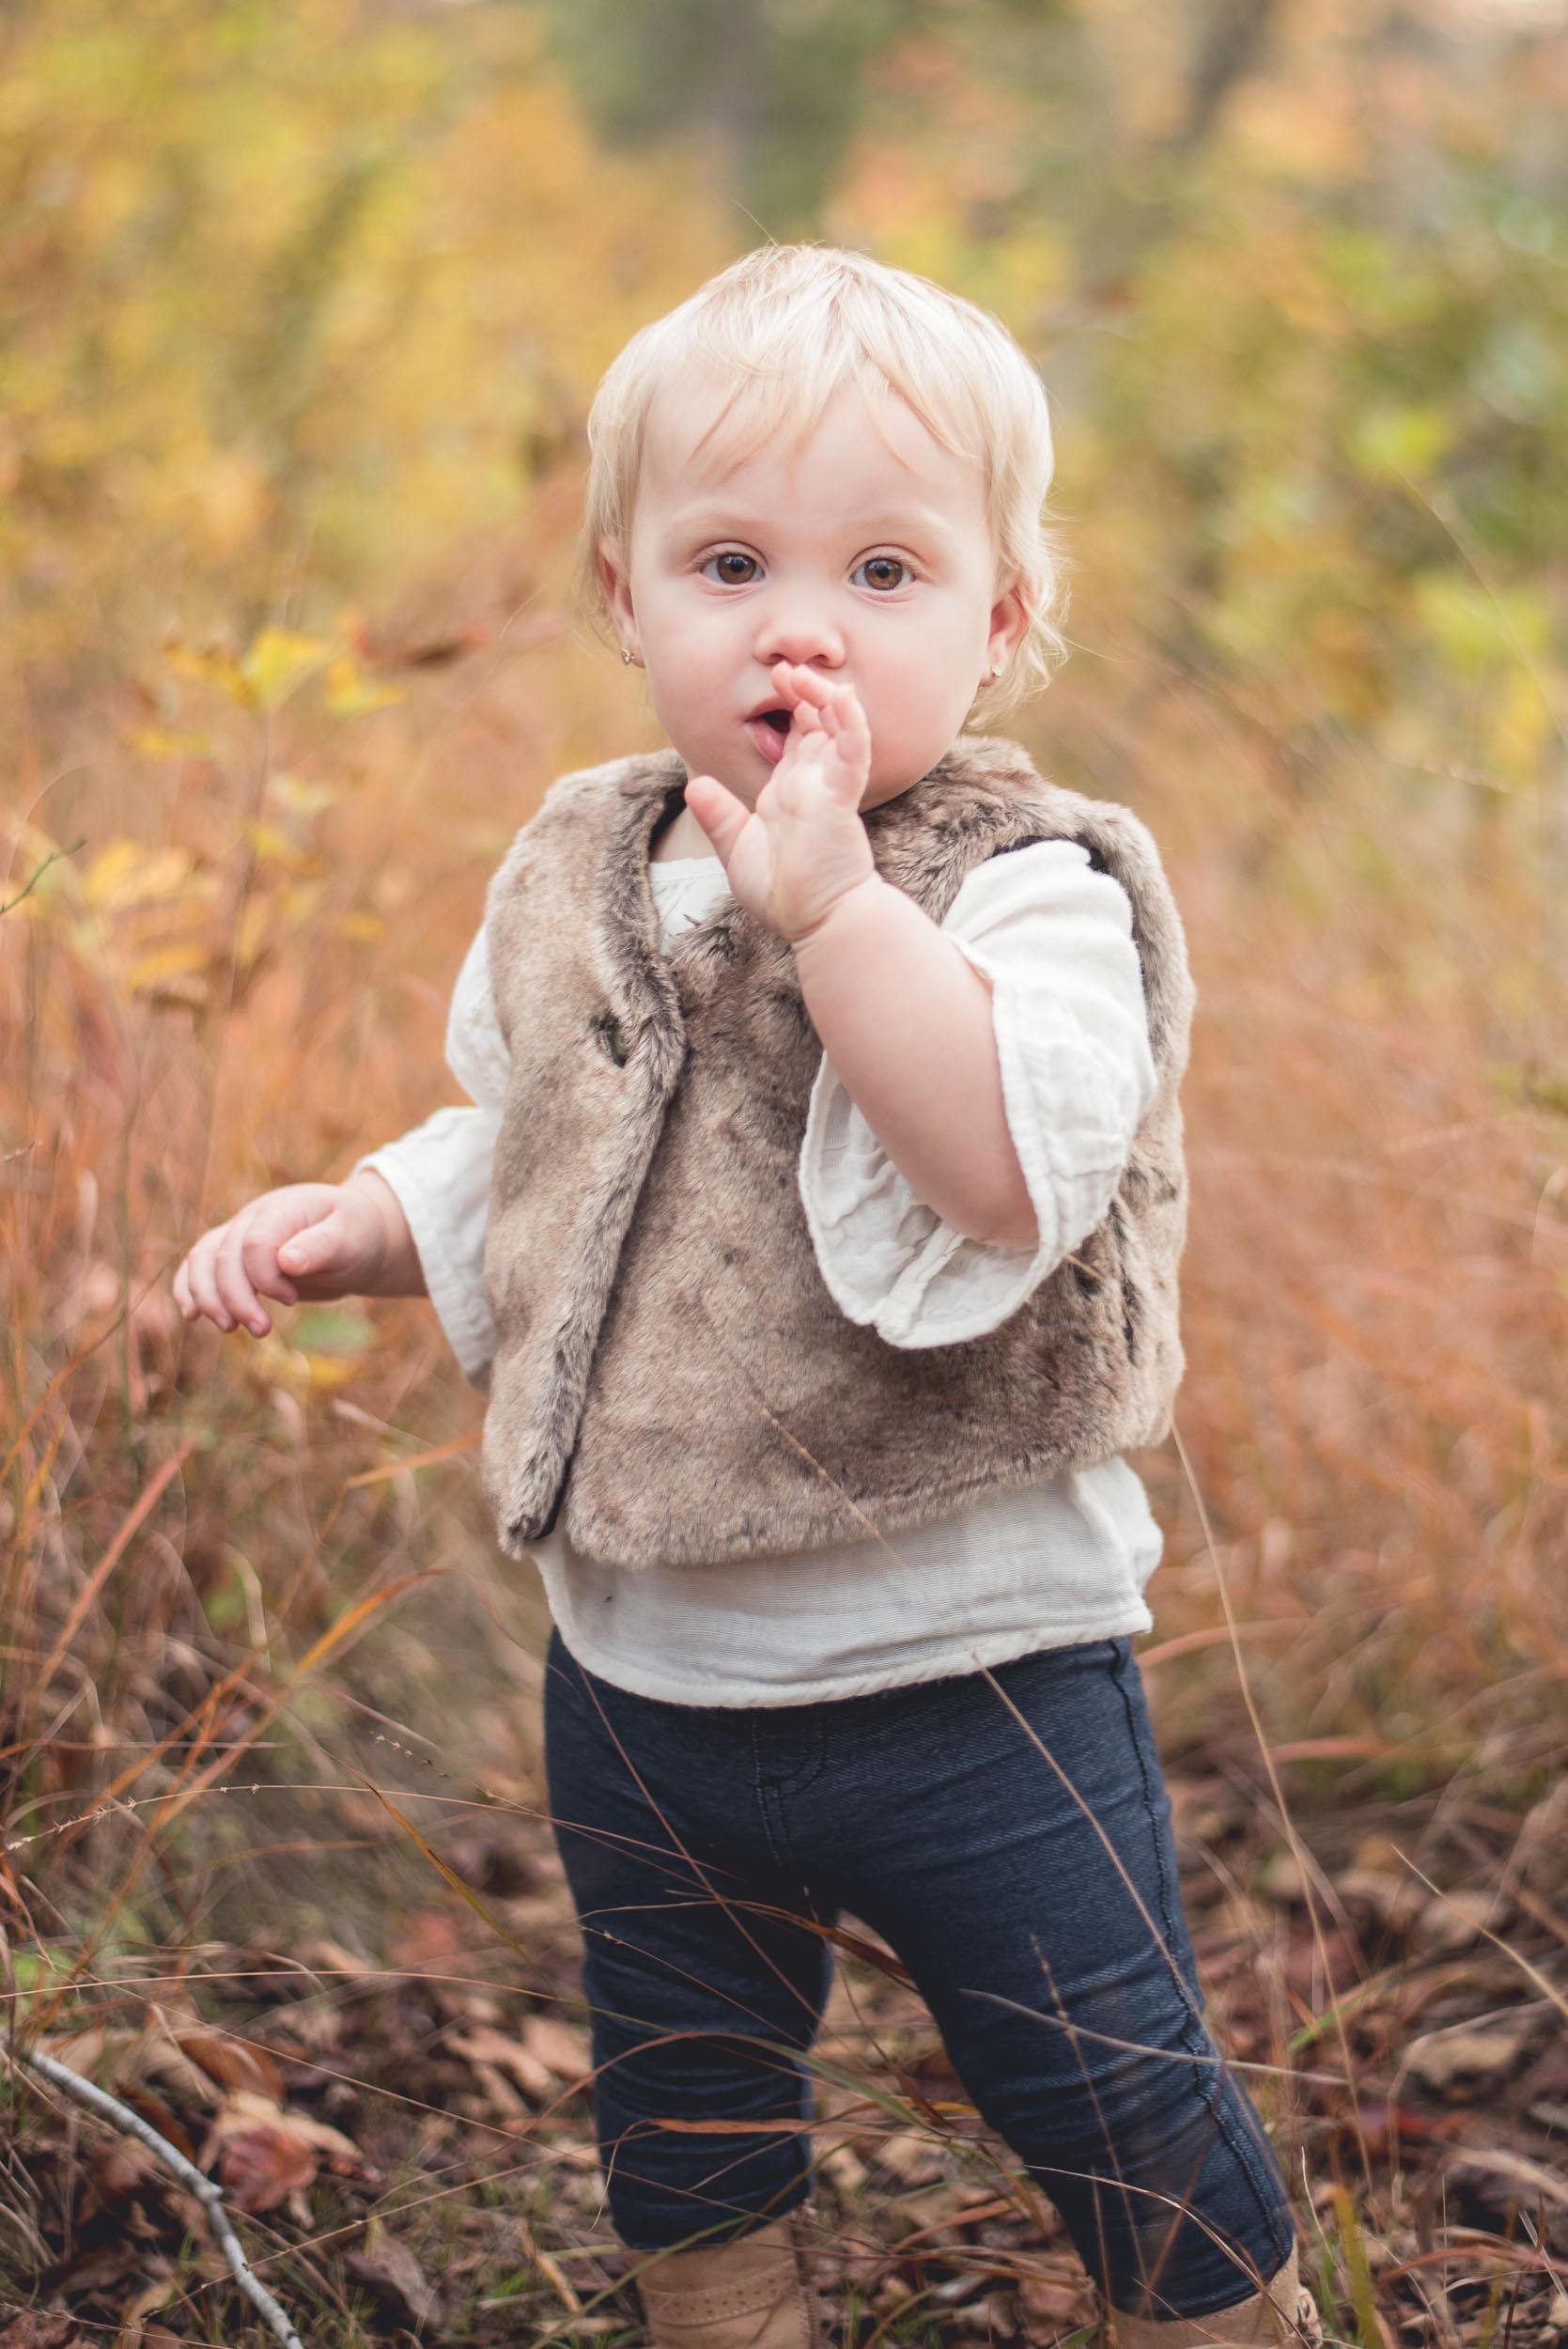 Ramsey_Child_Family_Photo_Session_Maryland_Crofton_Gambrills(10of12).jpg